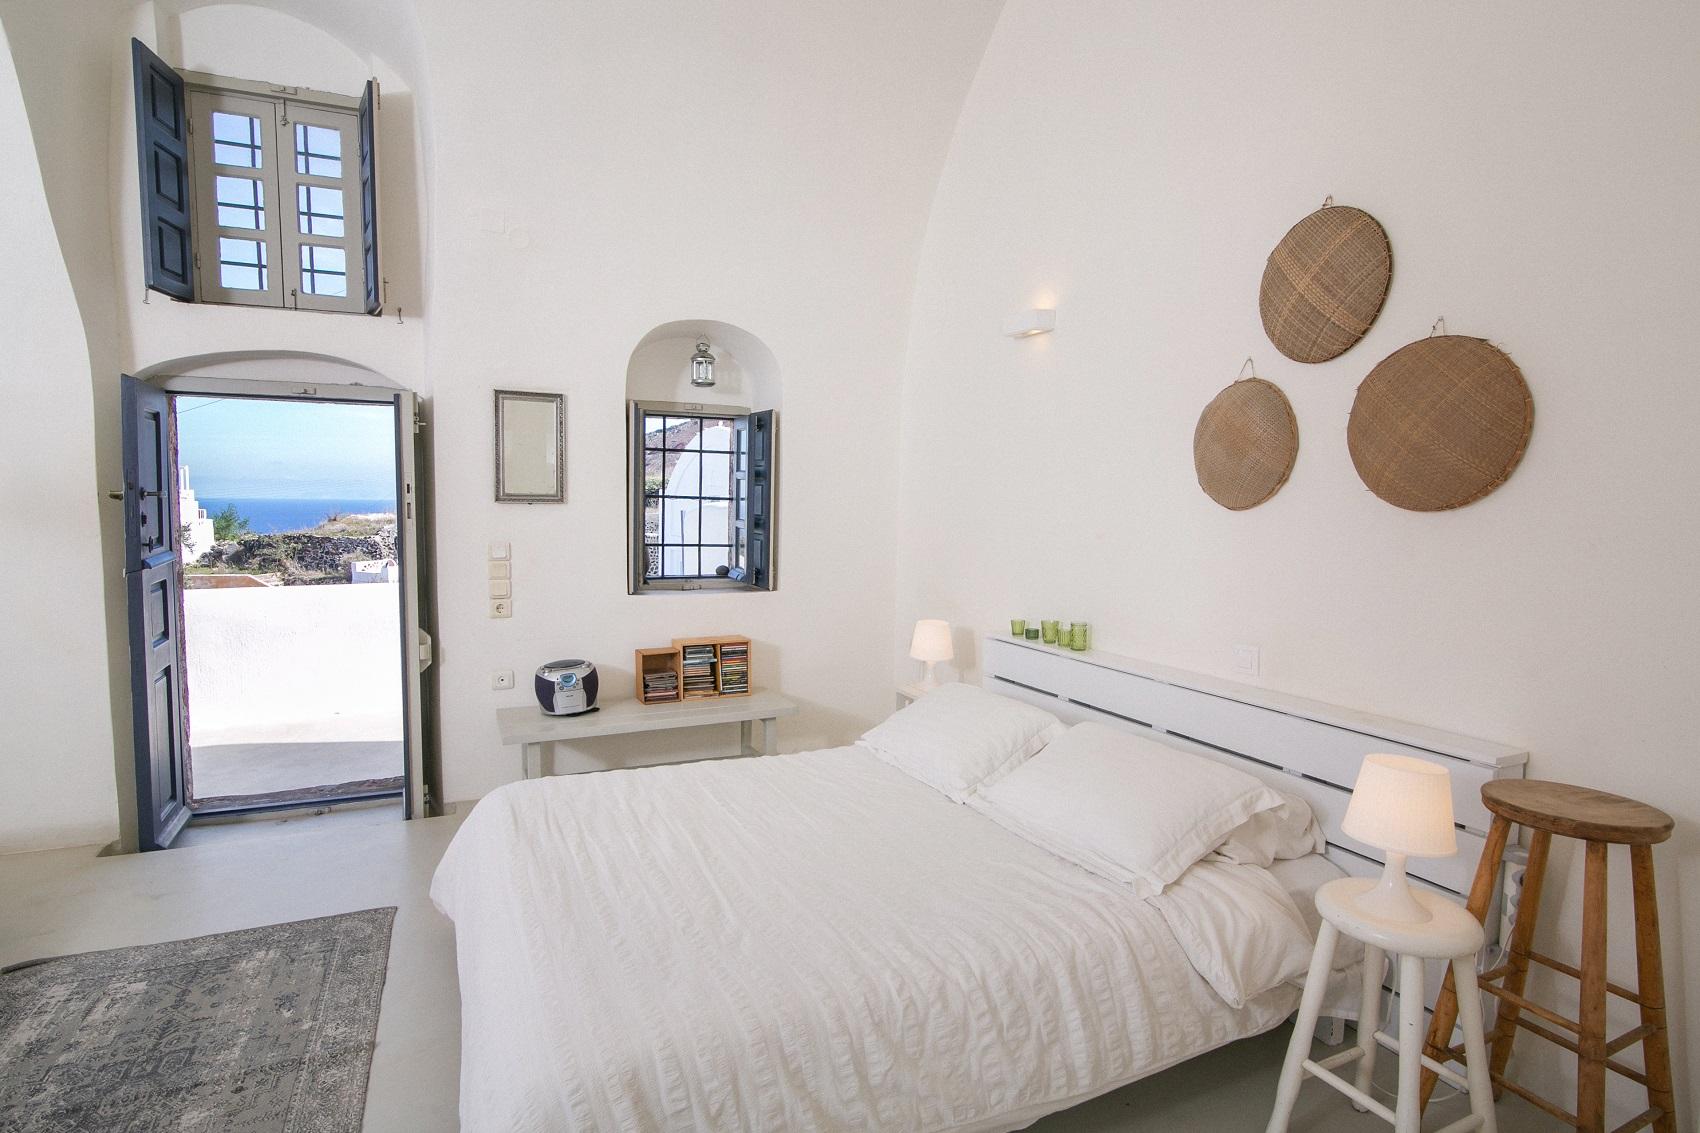 santorini accommodationsantorini accommodation